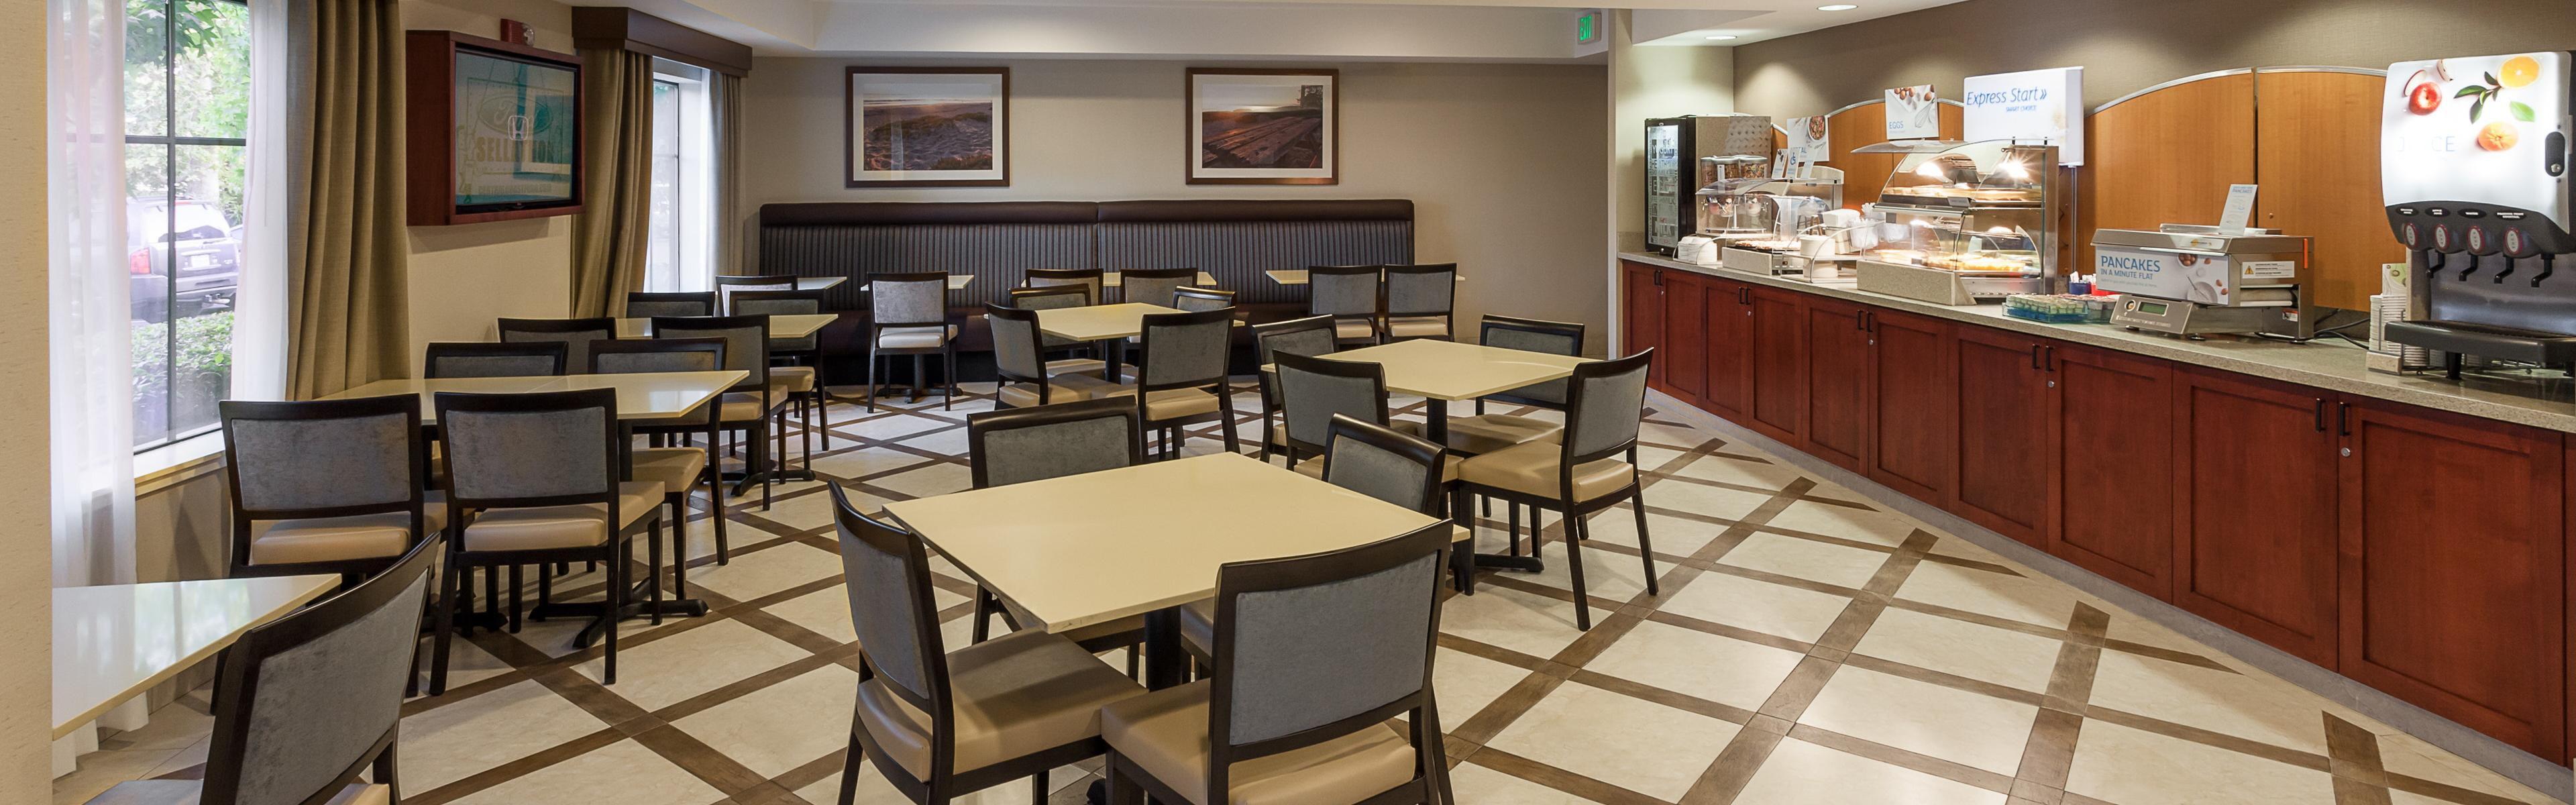 Holiday Inn Express & Suites Carpinteria image 3